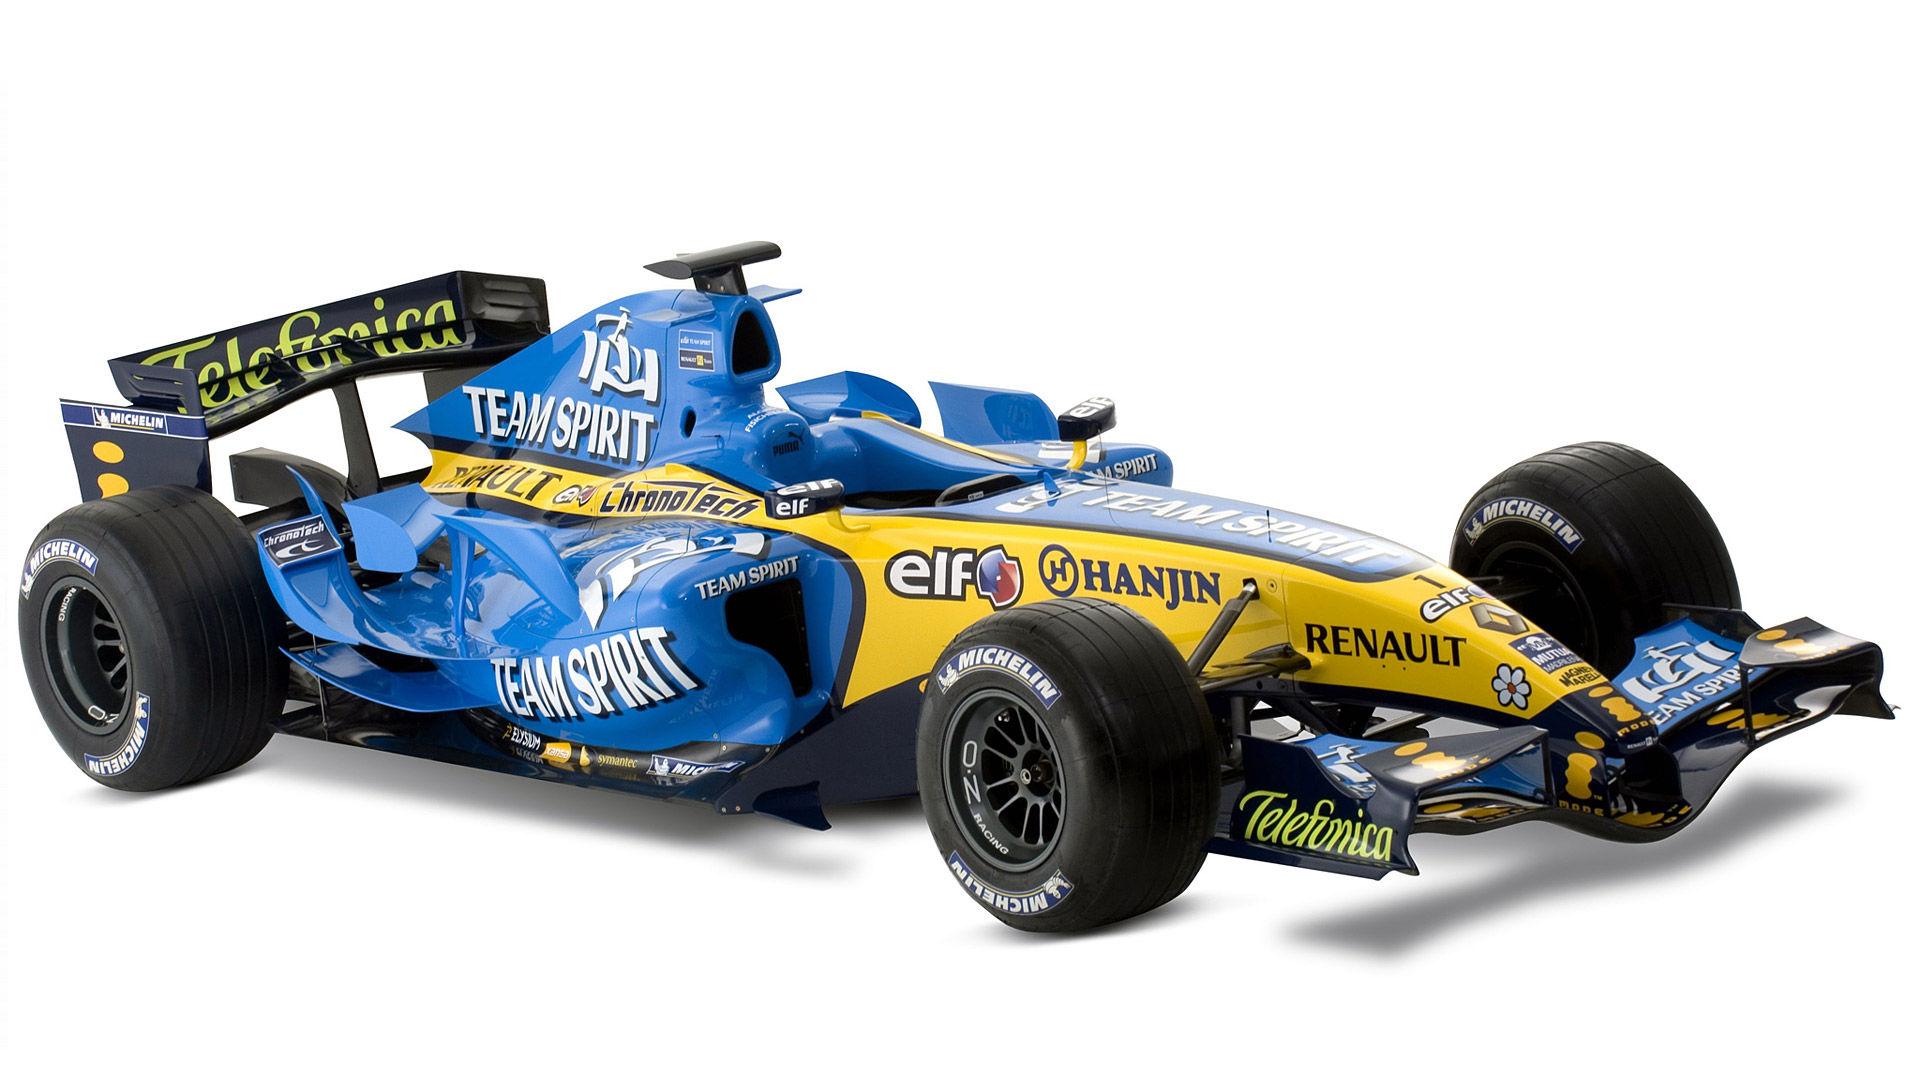 2006 Renault F1 R26